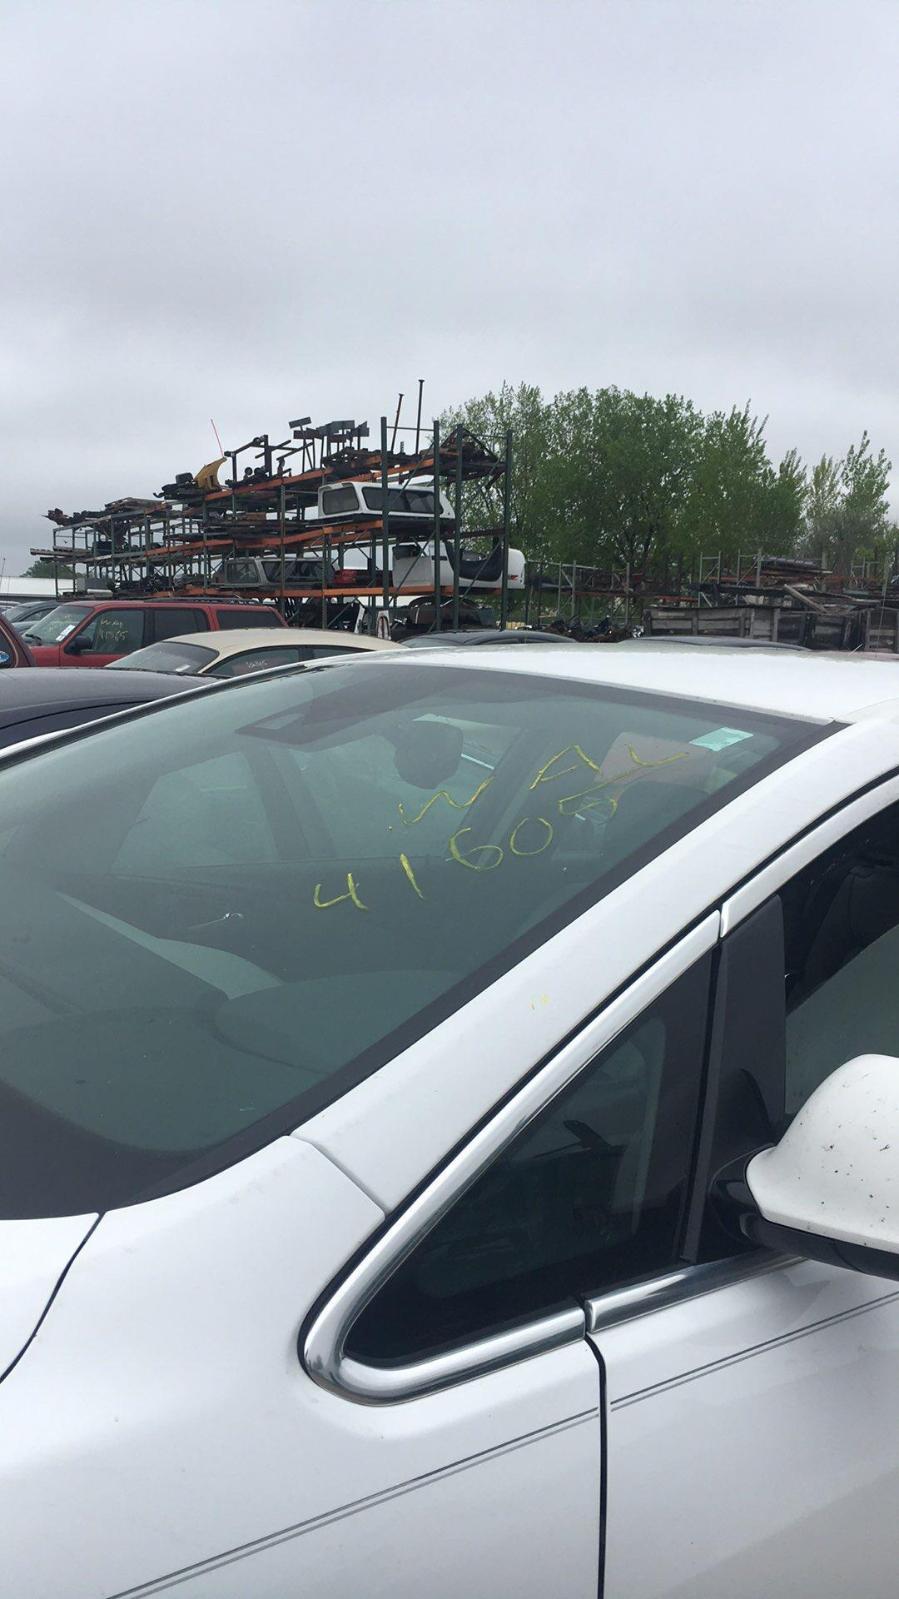 2014 2015 Buick Lacrosse Door Mirror Right RH Passenger OEM Mirror